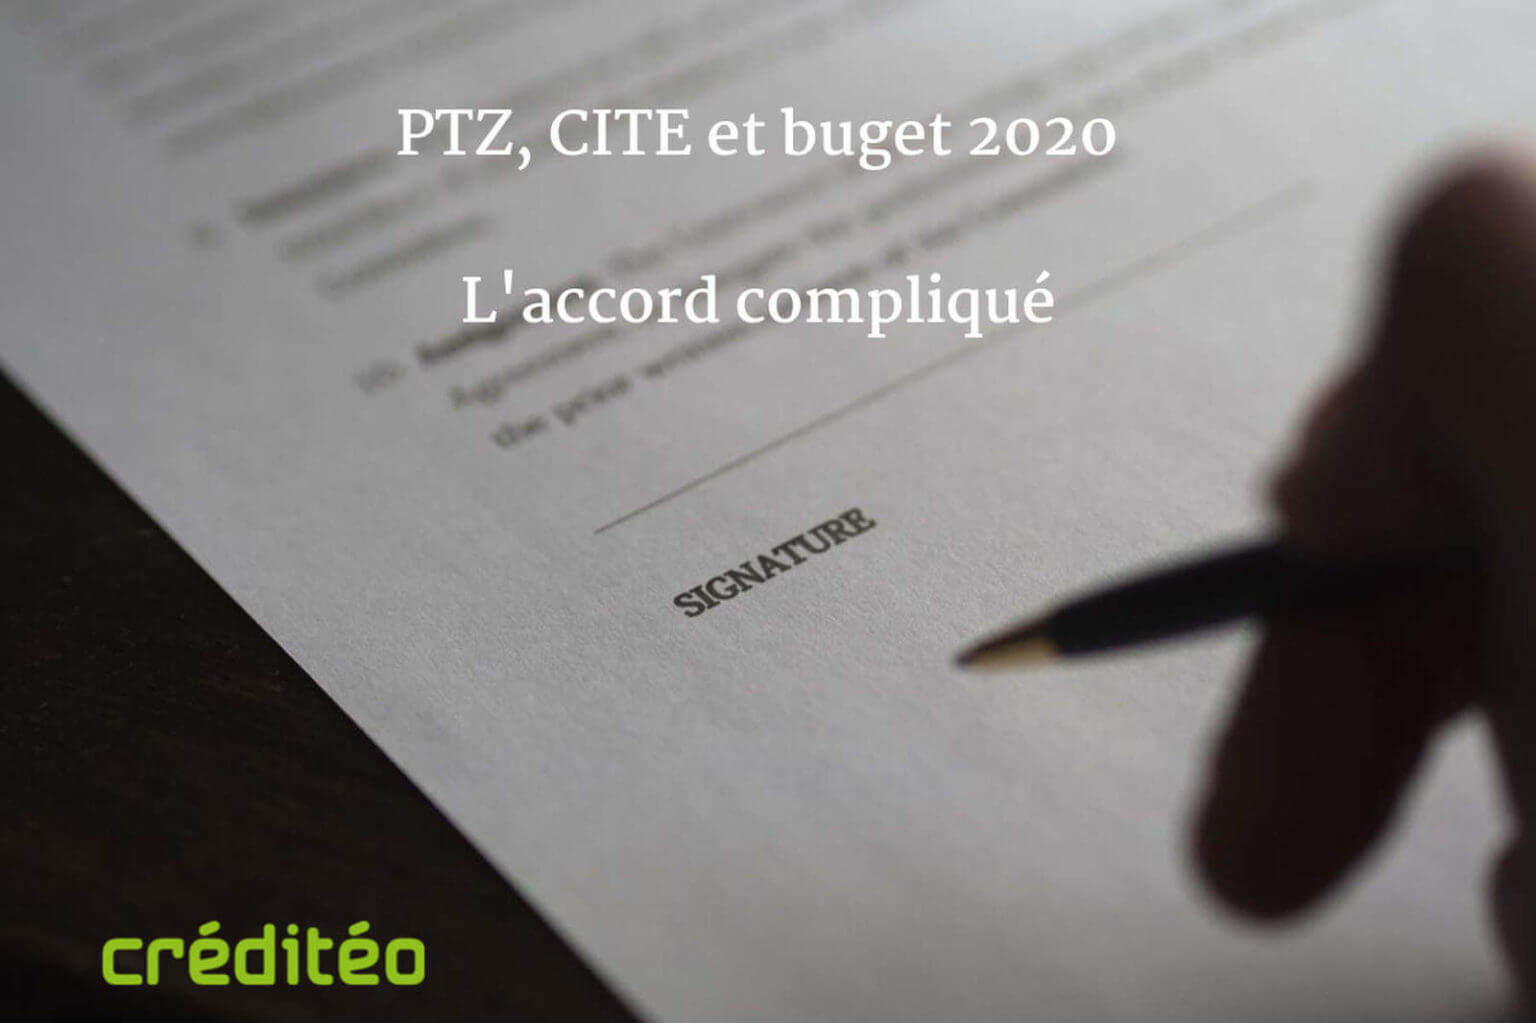 PTZ, CITE, budget 2020, l'accord compliqué